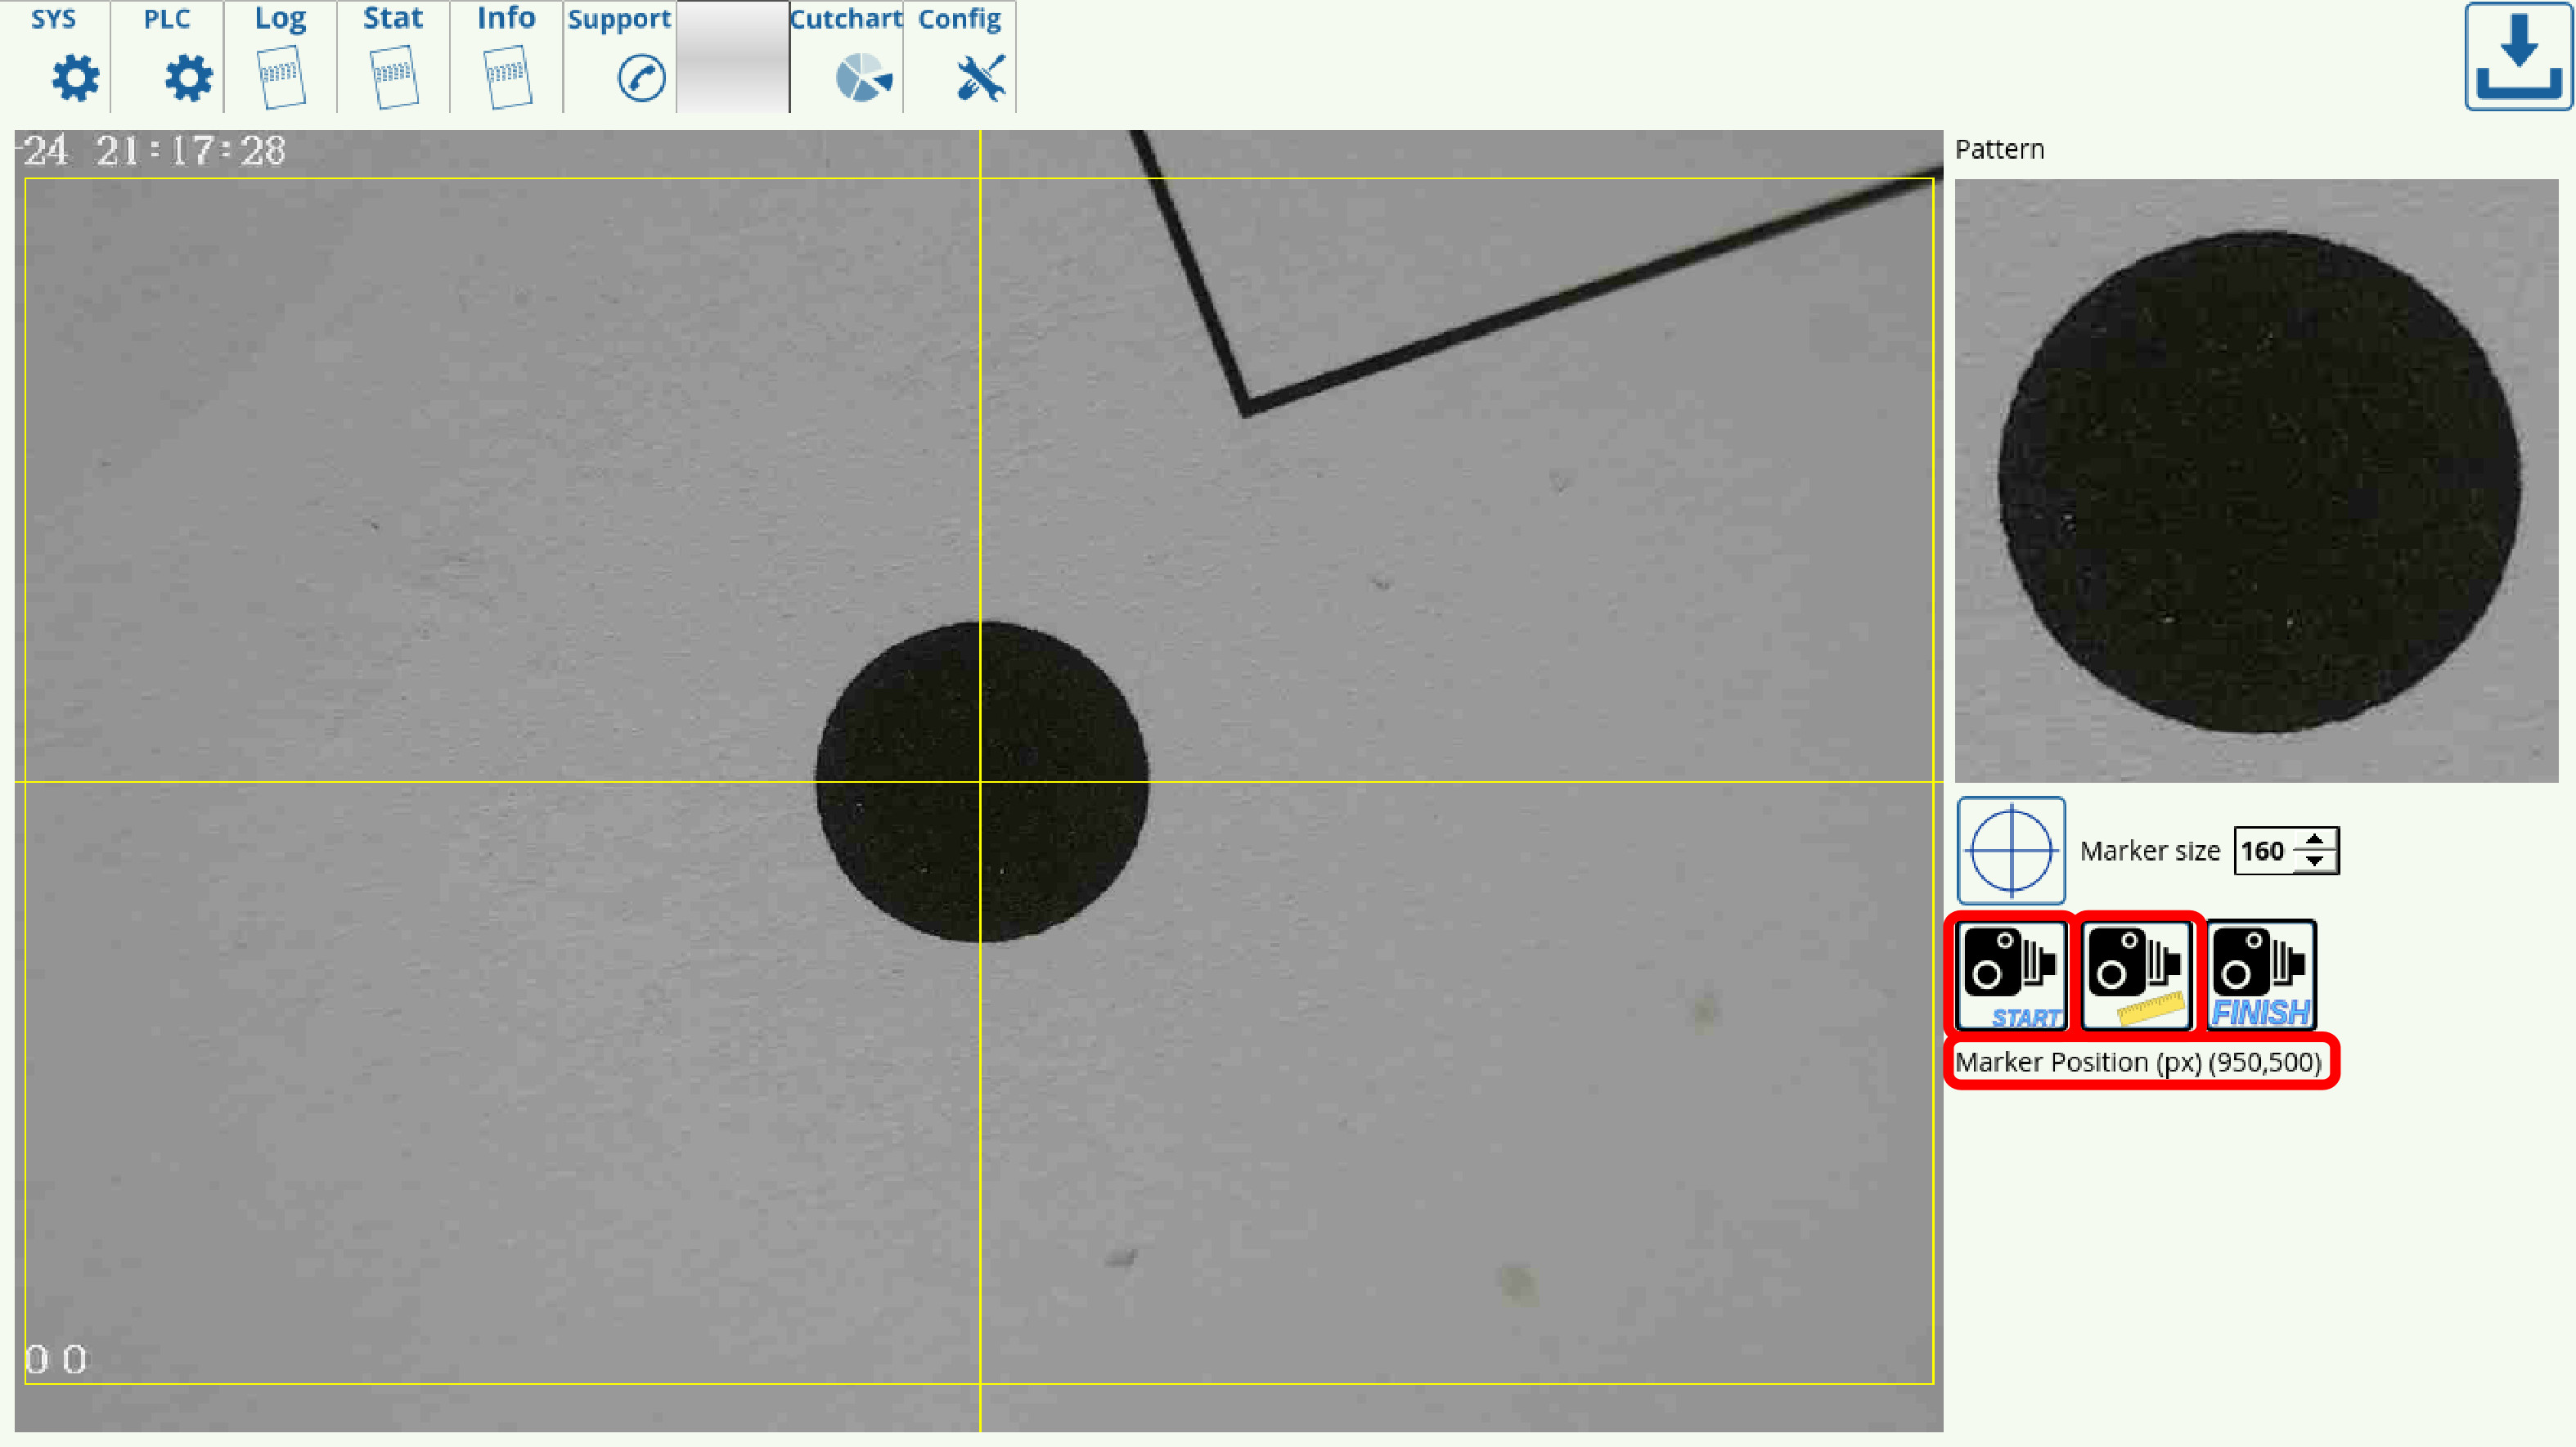 cnc-vision-007-start-measure.jpg